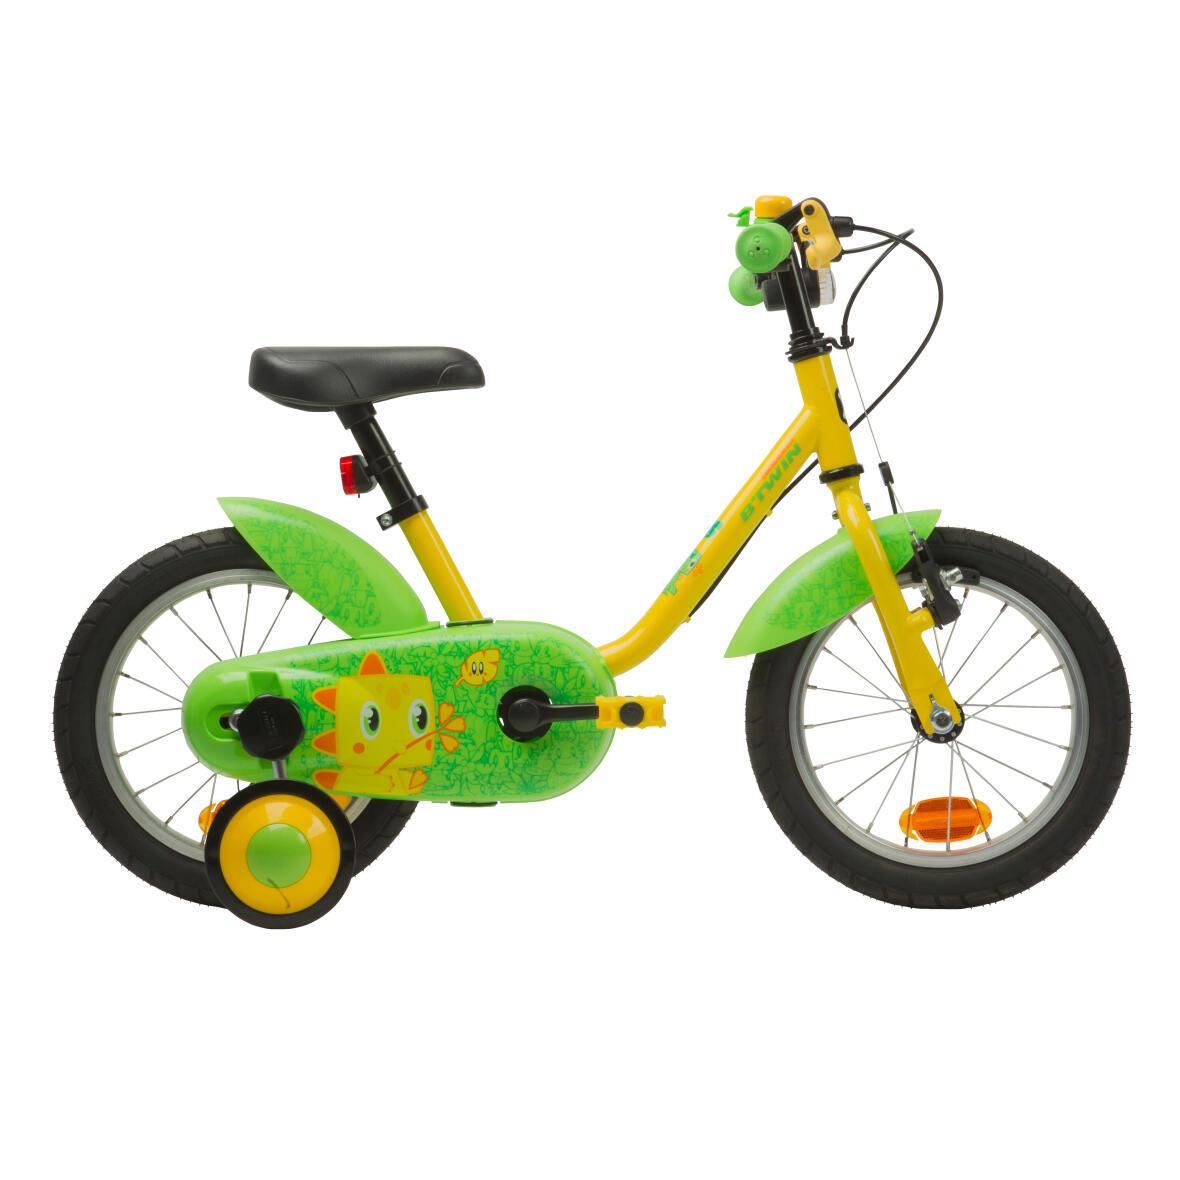 bicicleta_14_pouces_vert_jaune